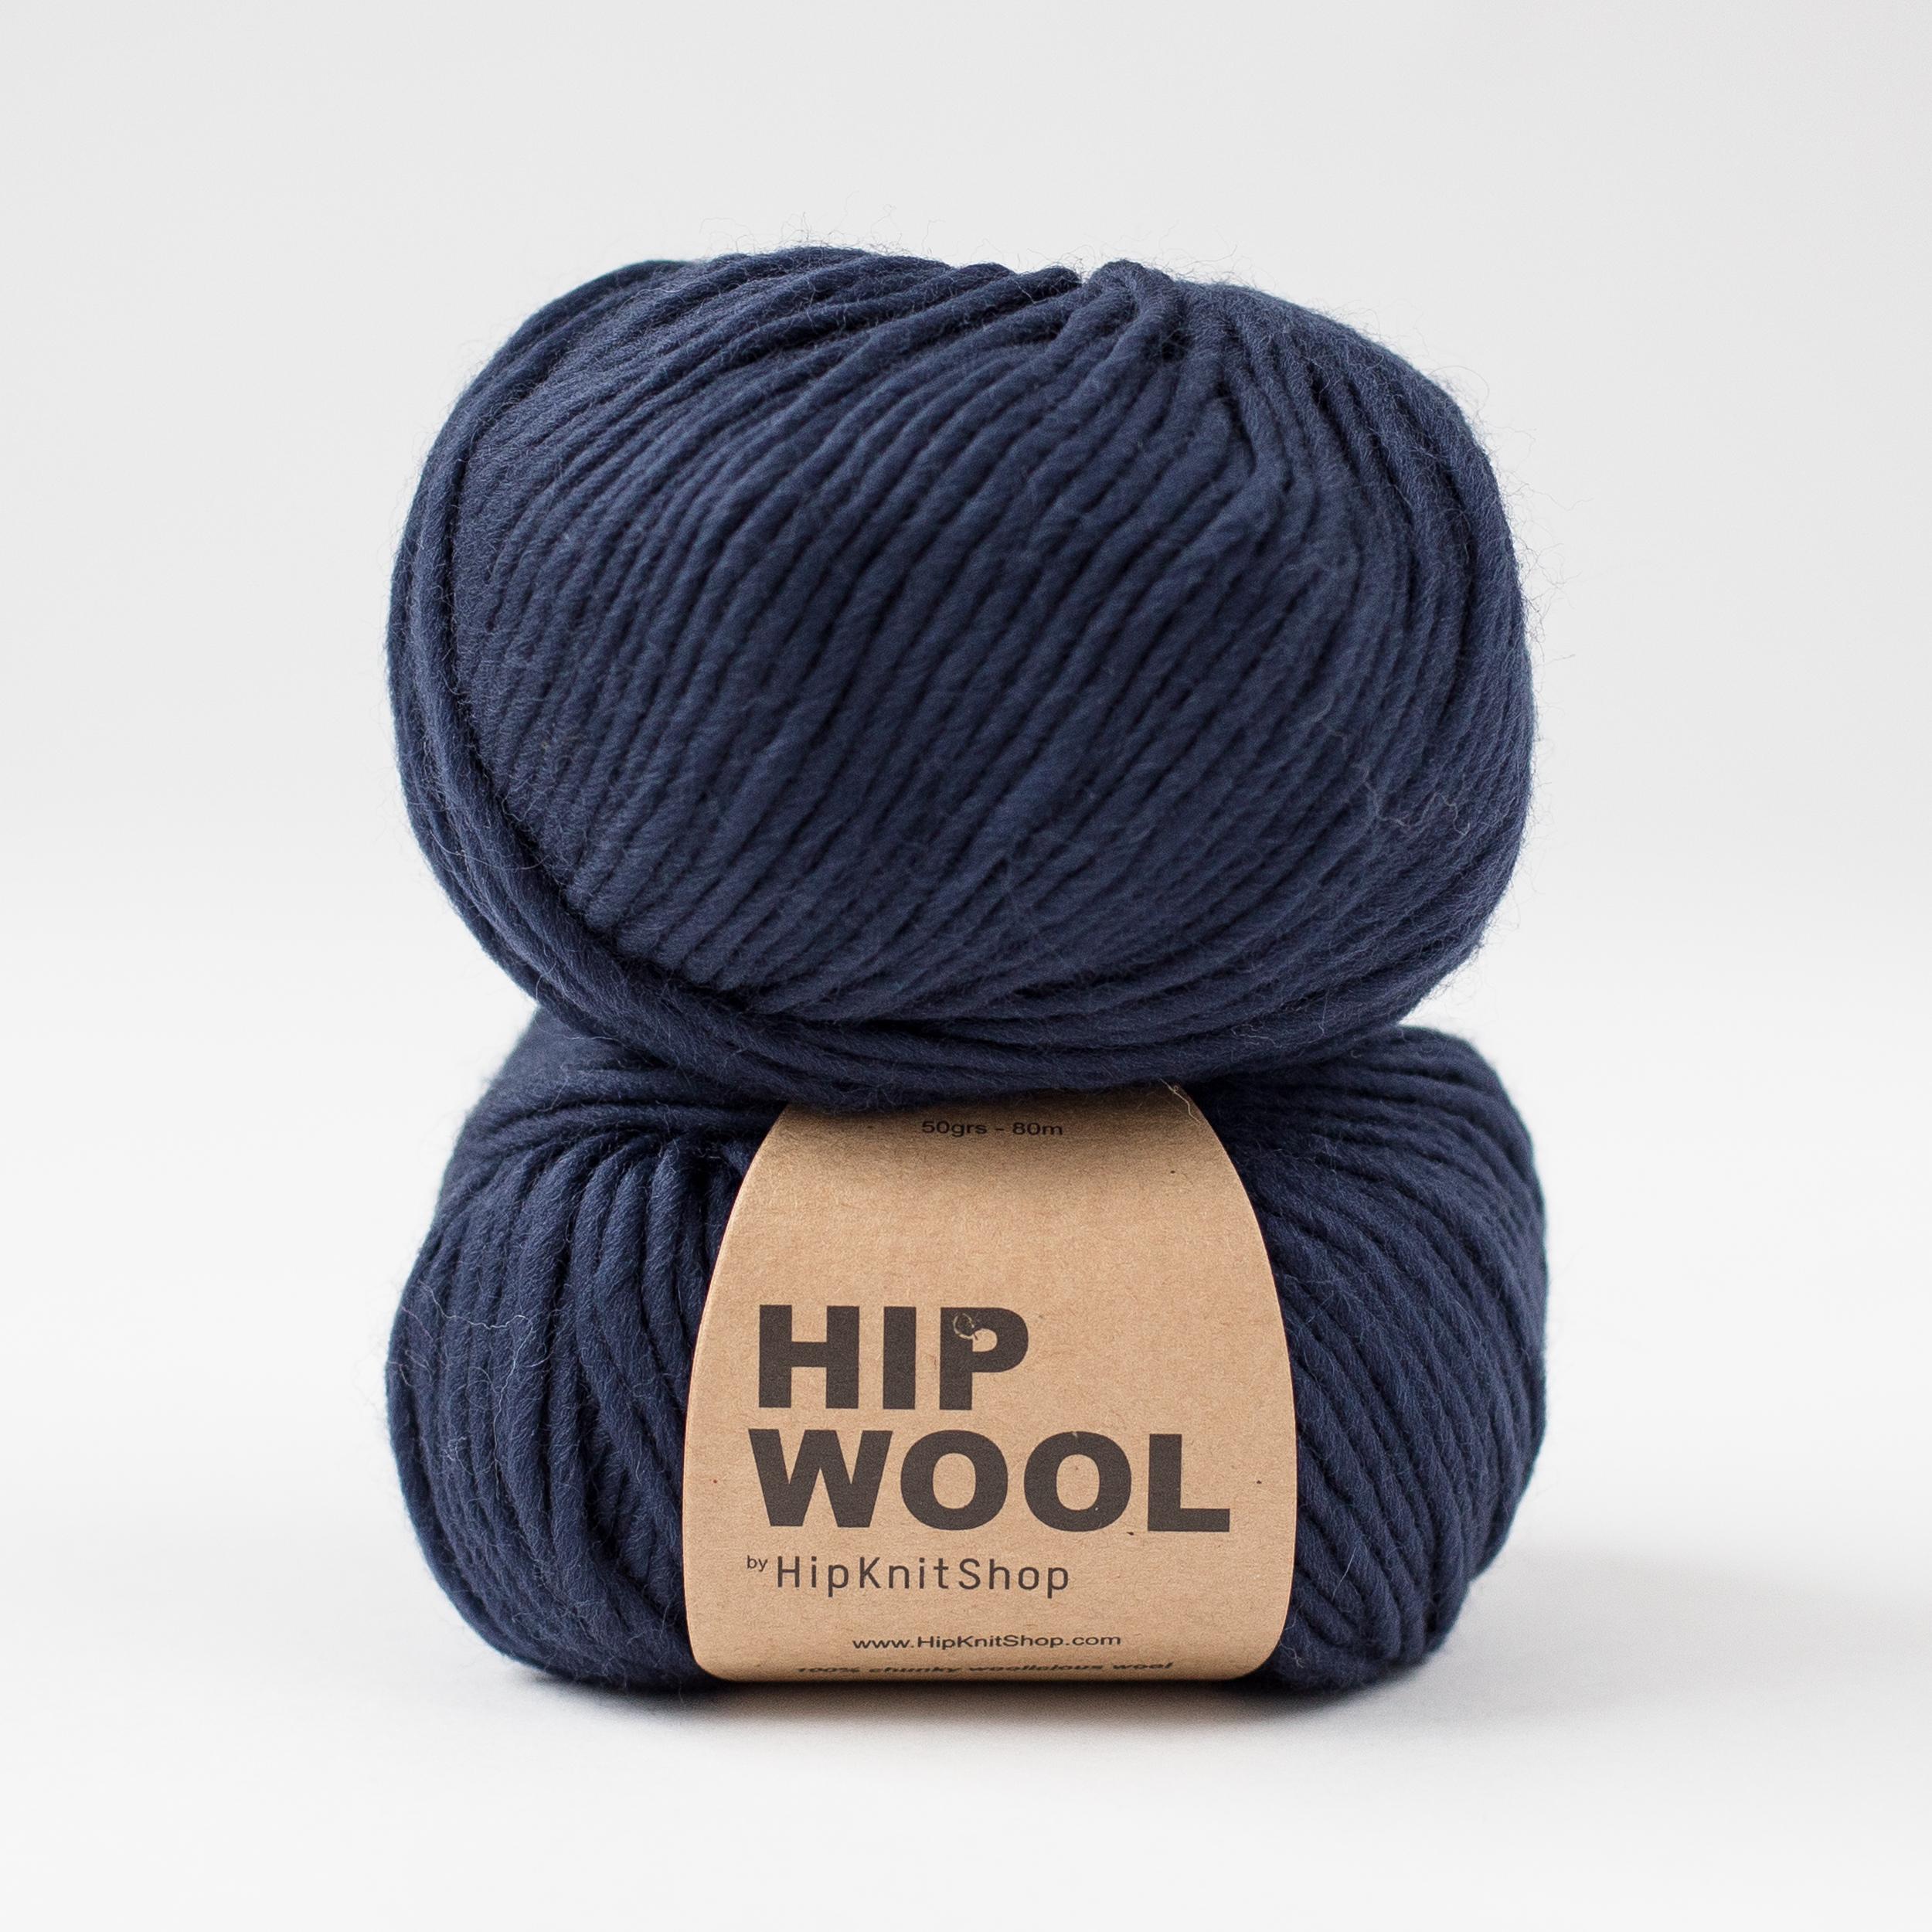 Hip Wool – 100 % wool yarn